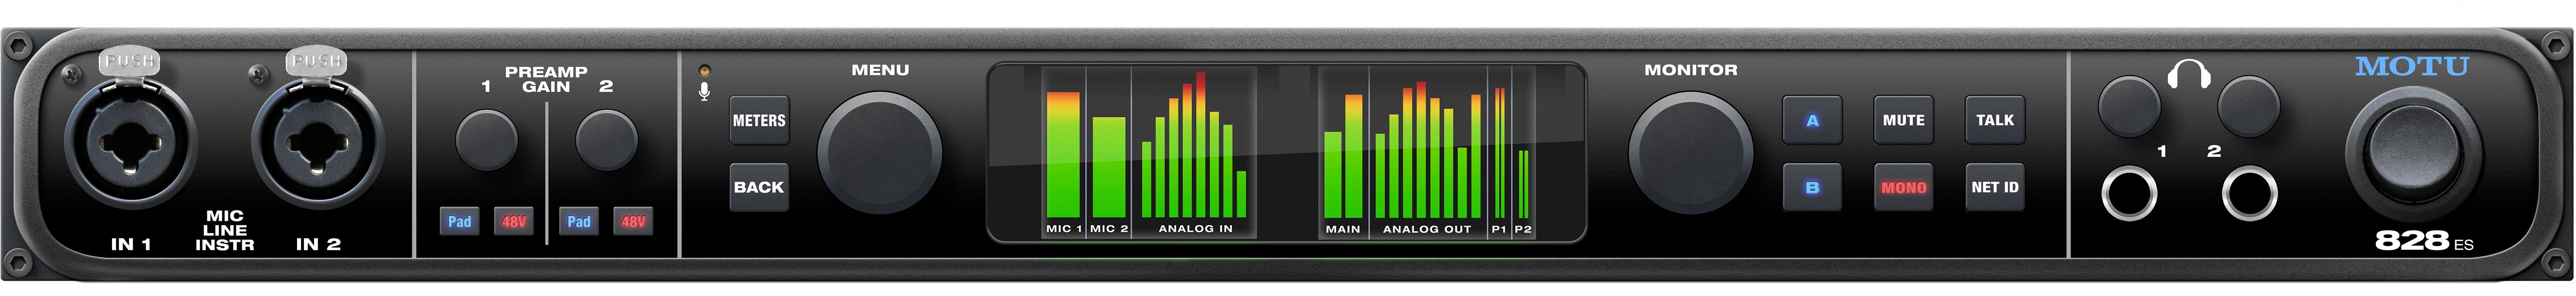 motu 828es audio interface - front